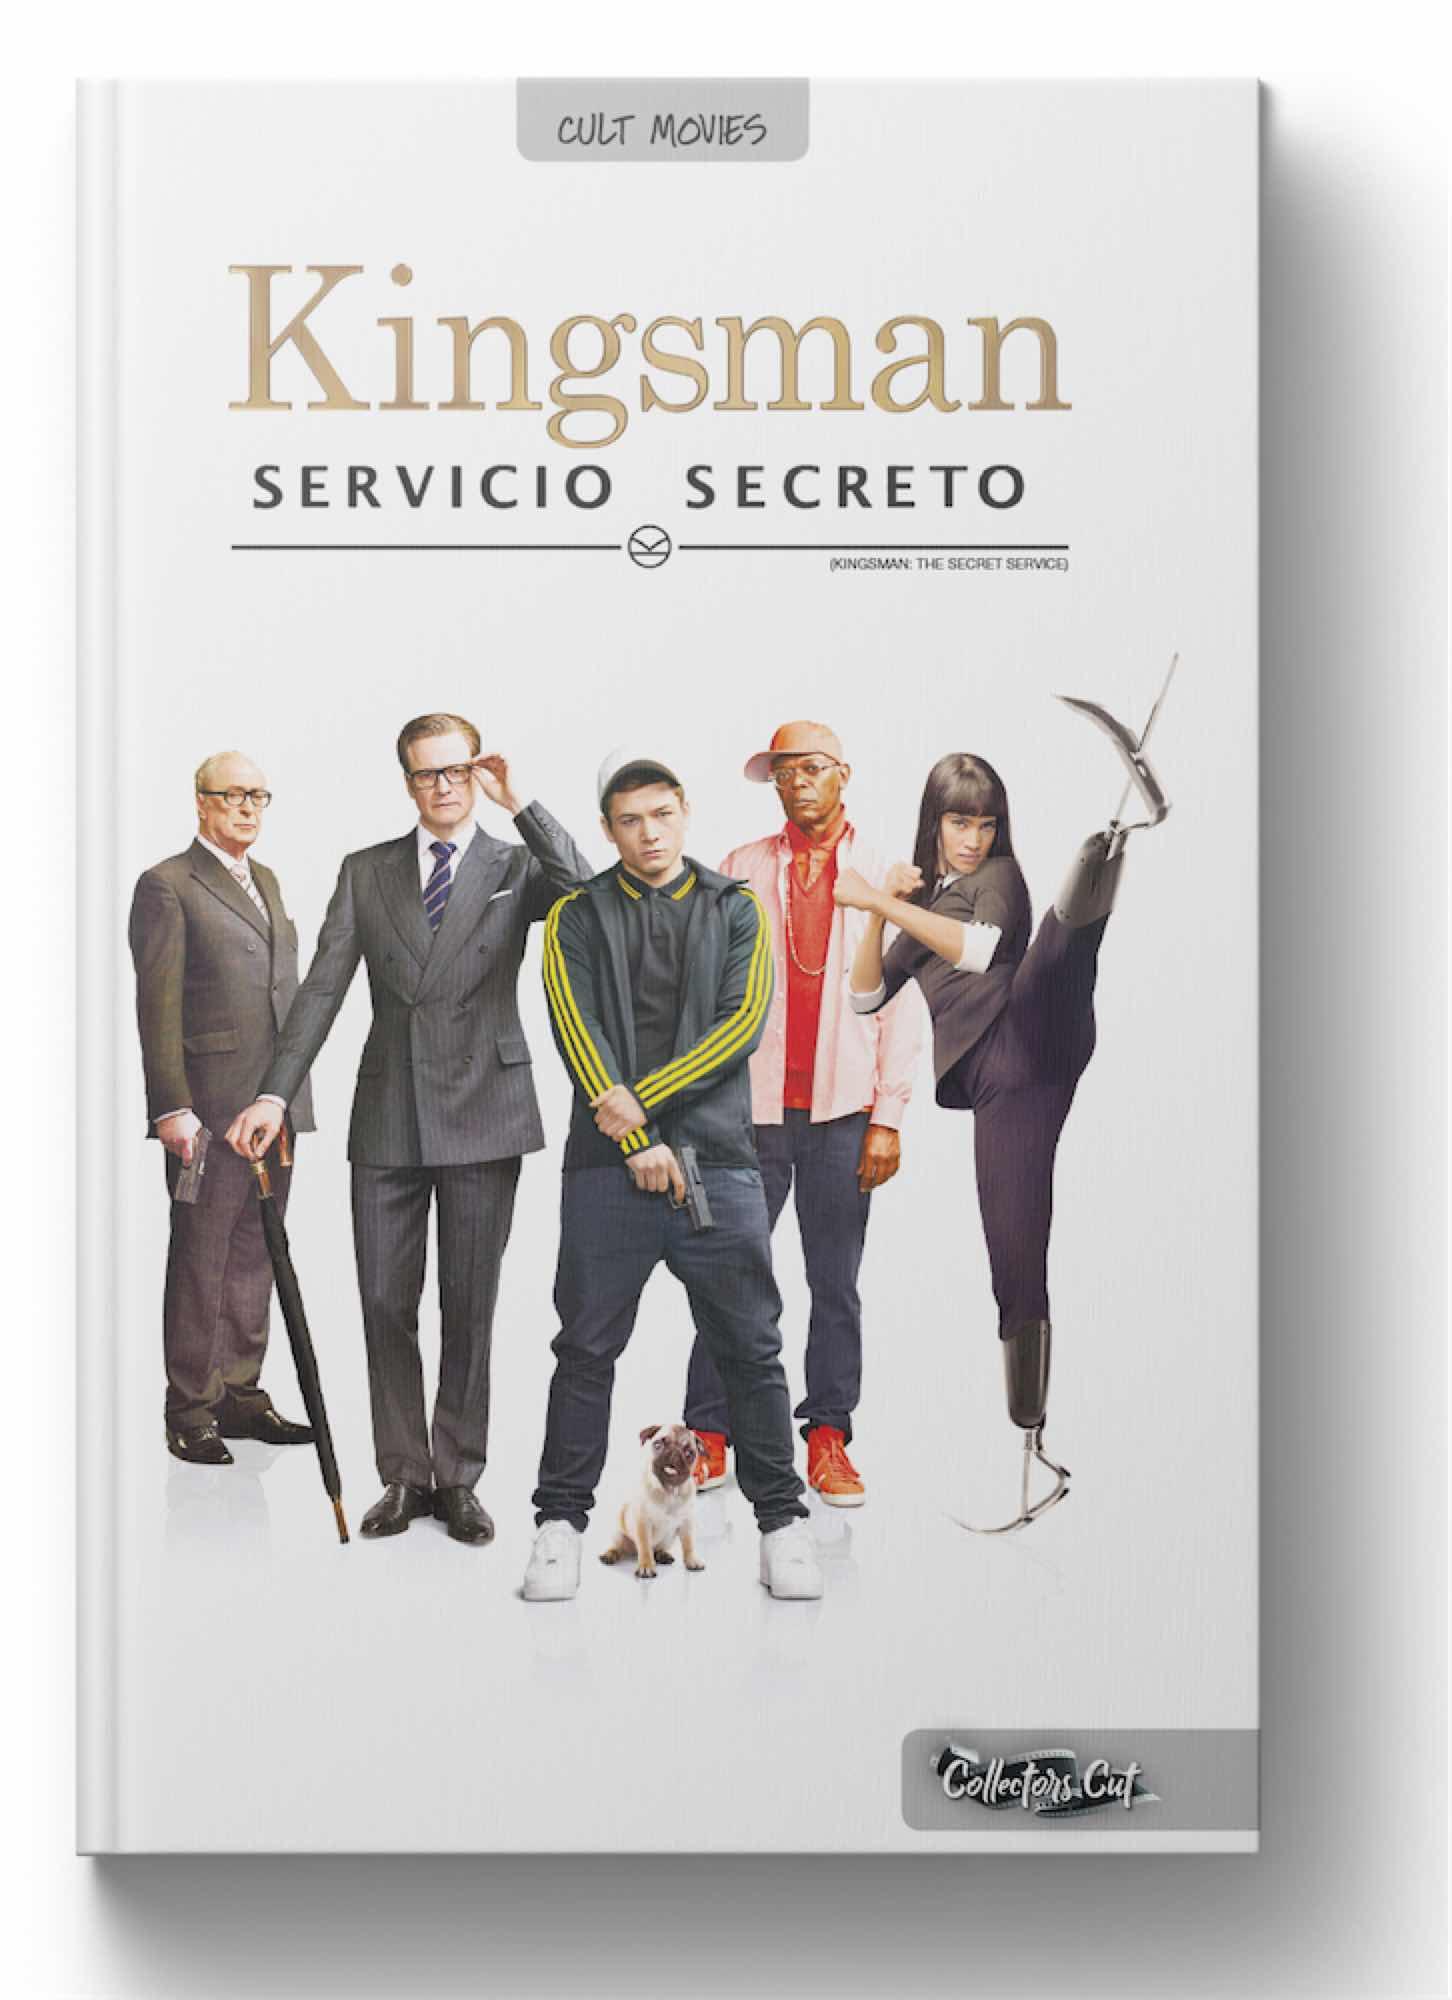 KINGSMAN. SERVICIO SECRETO  (COLLECTOR'S CUT)